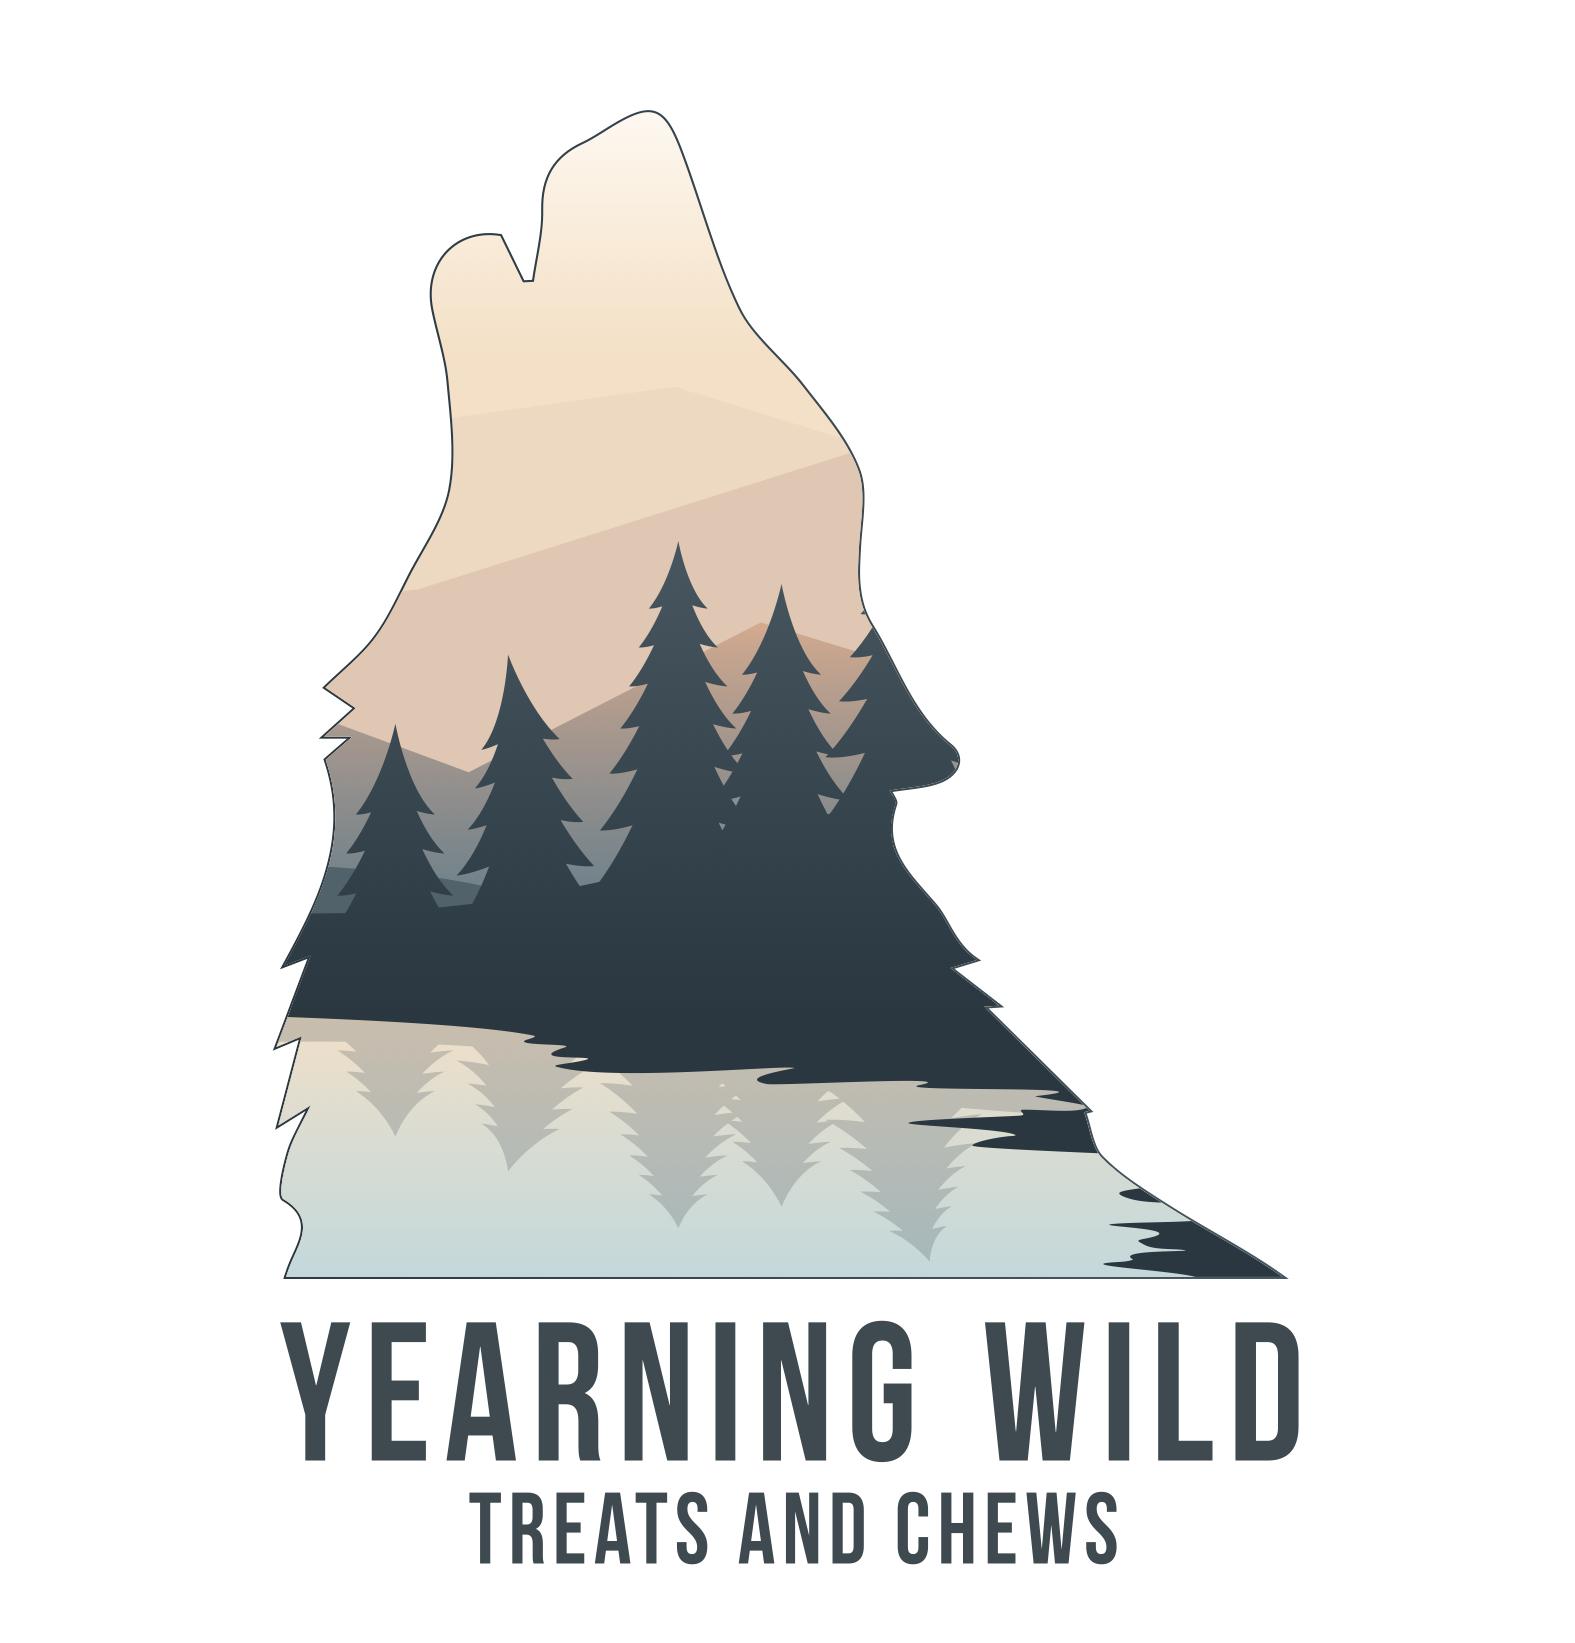 YEARNING_WILD_LOGO_WITH_TREATS_AND_CEWS_(1).jpg